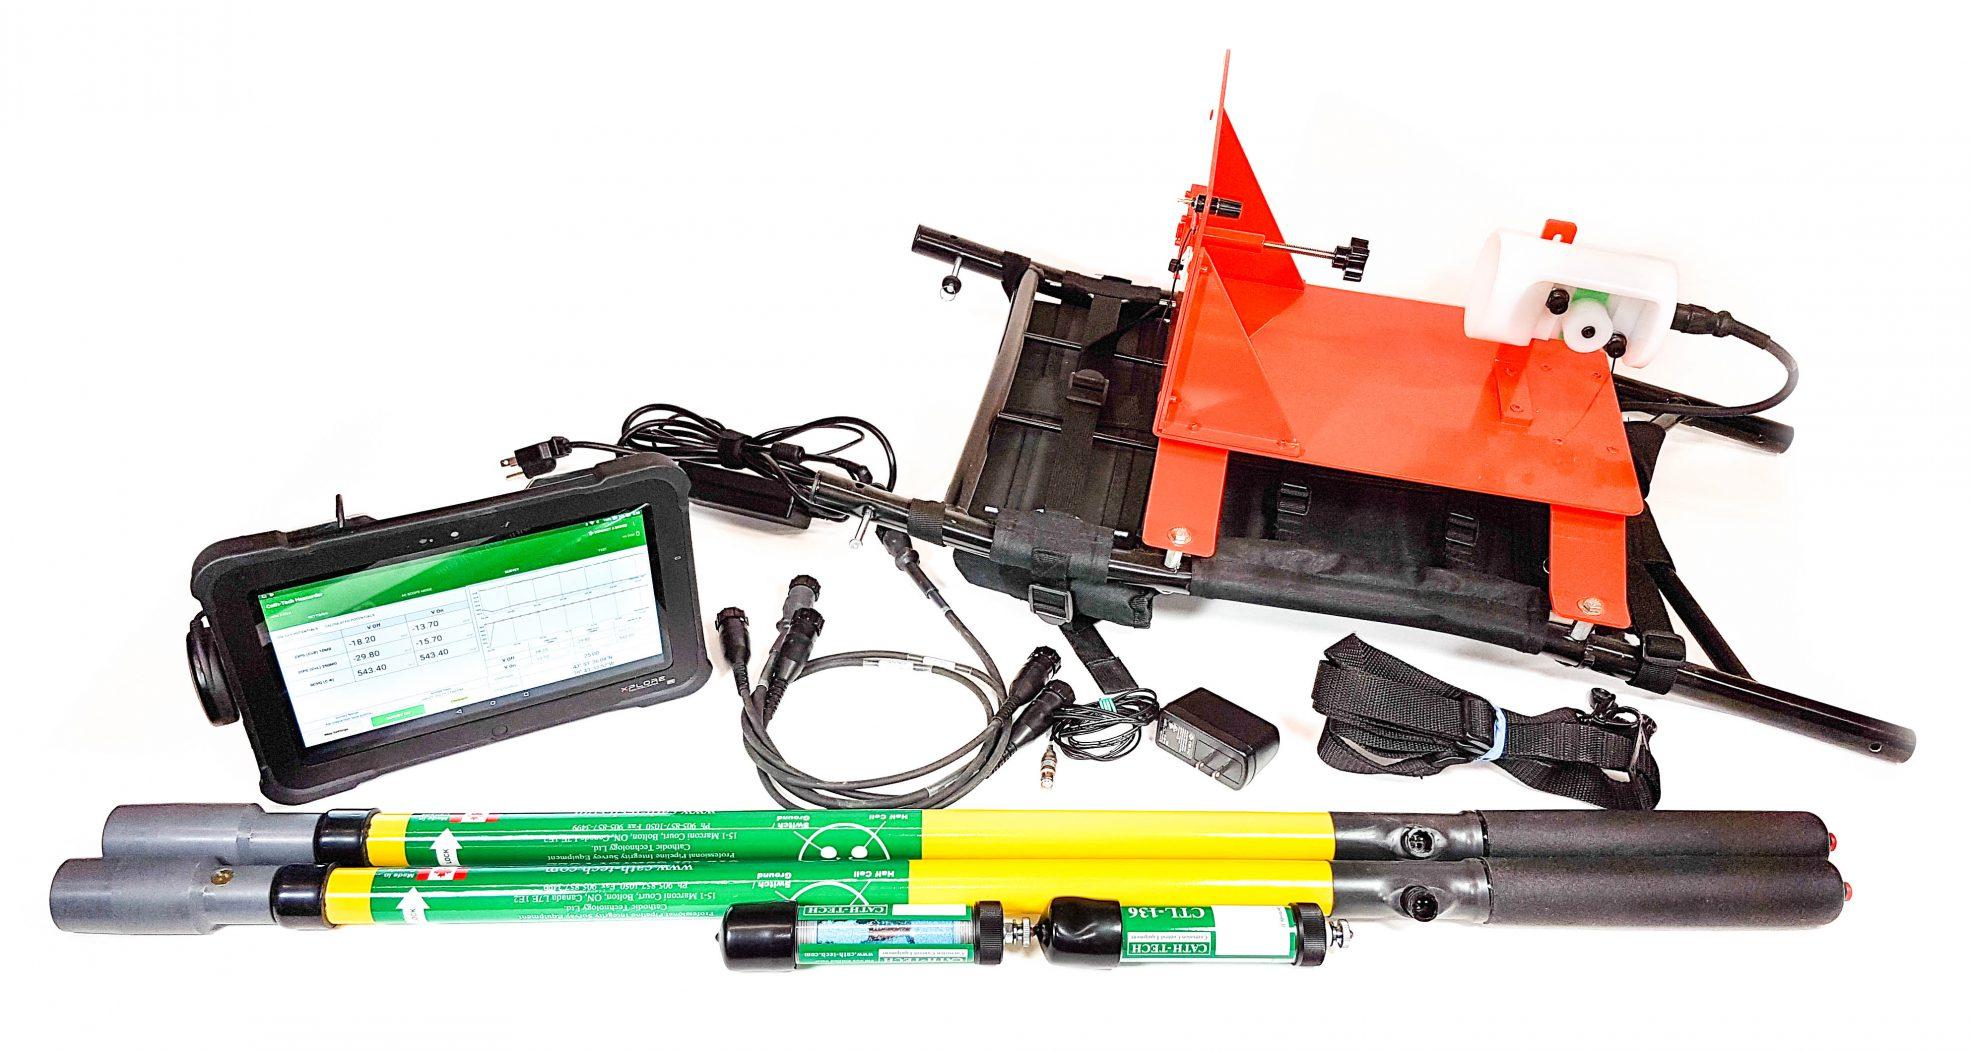 Cath-Tech Hexcorder Pro